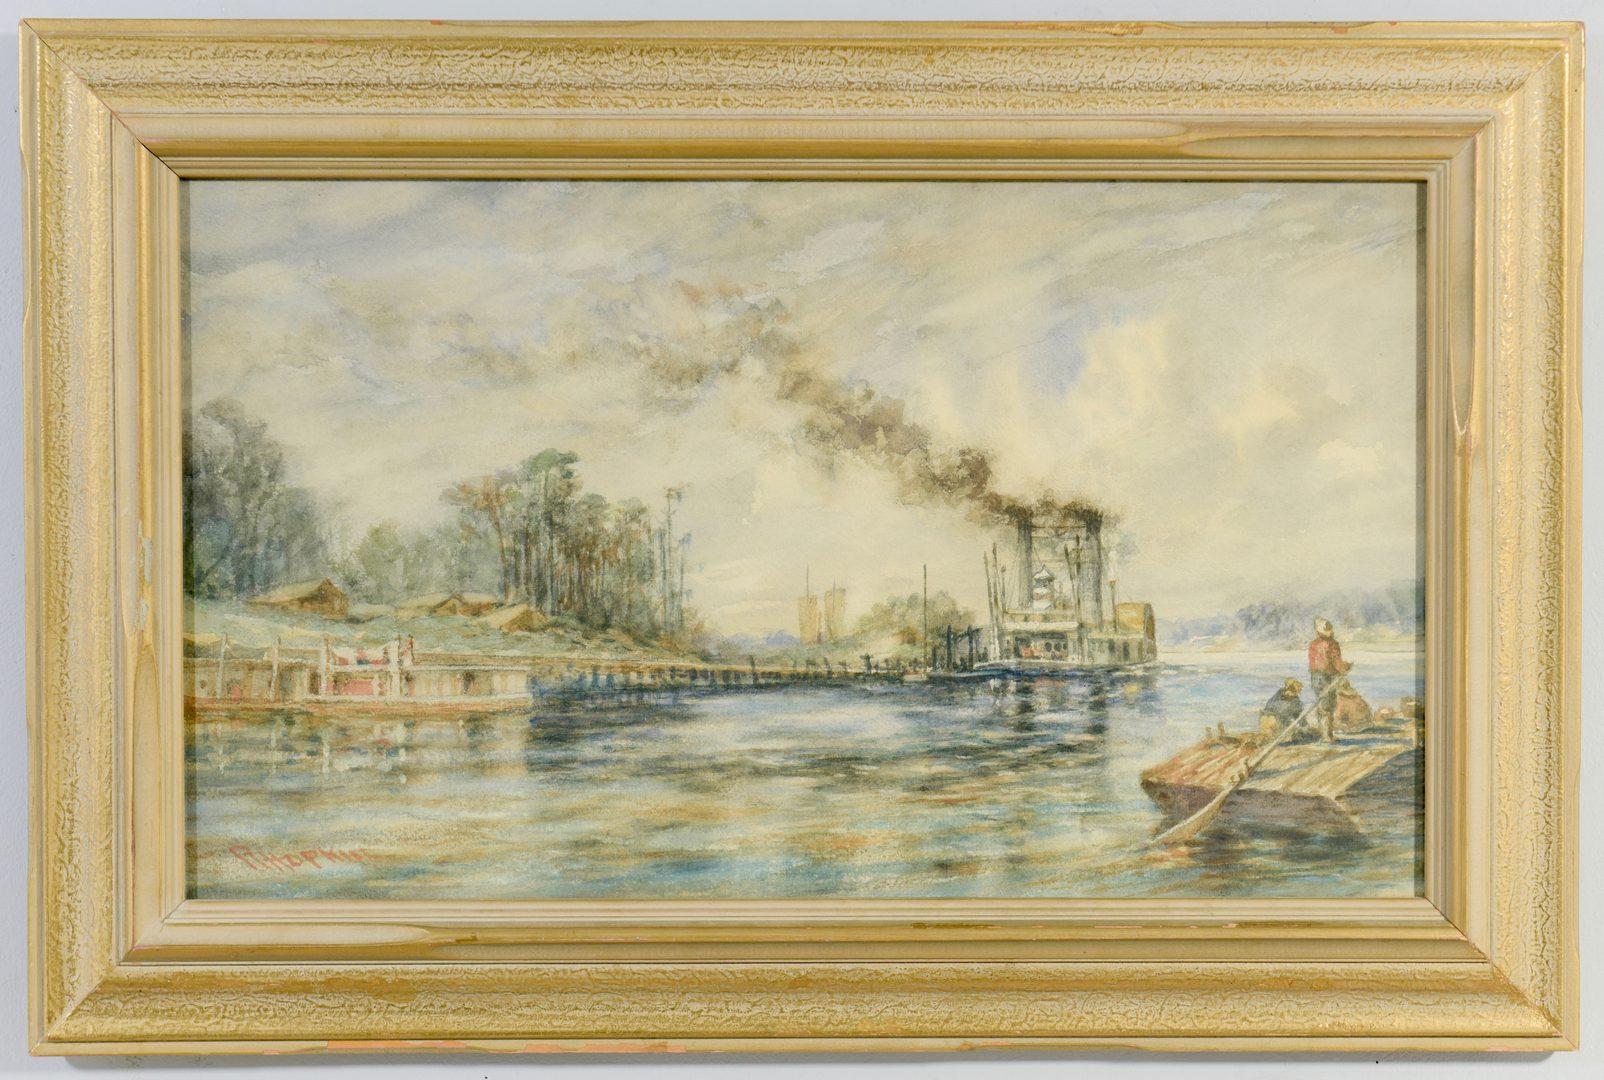 Lot 548: Robert Hopkin Landscape with Riverboat